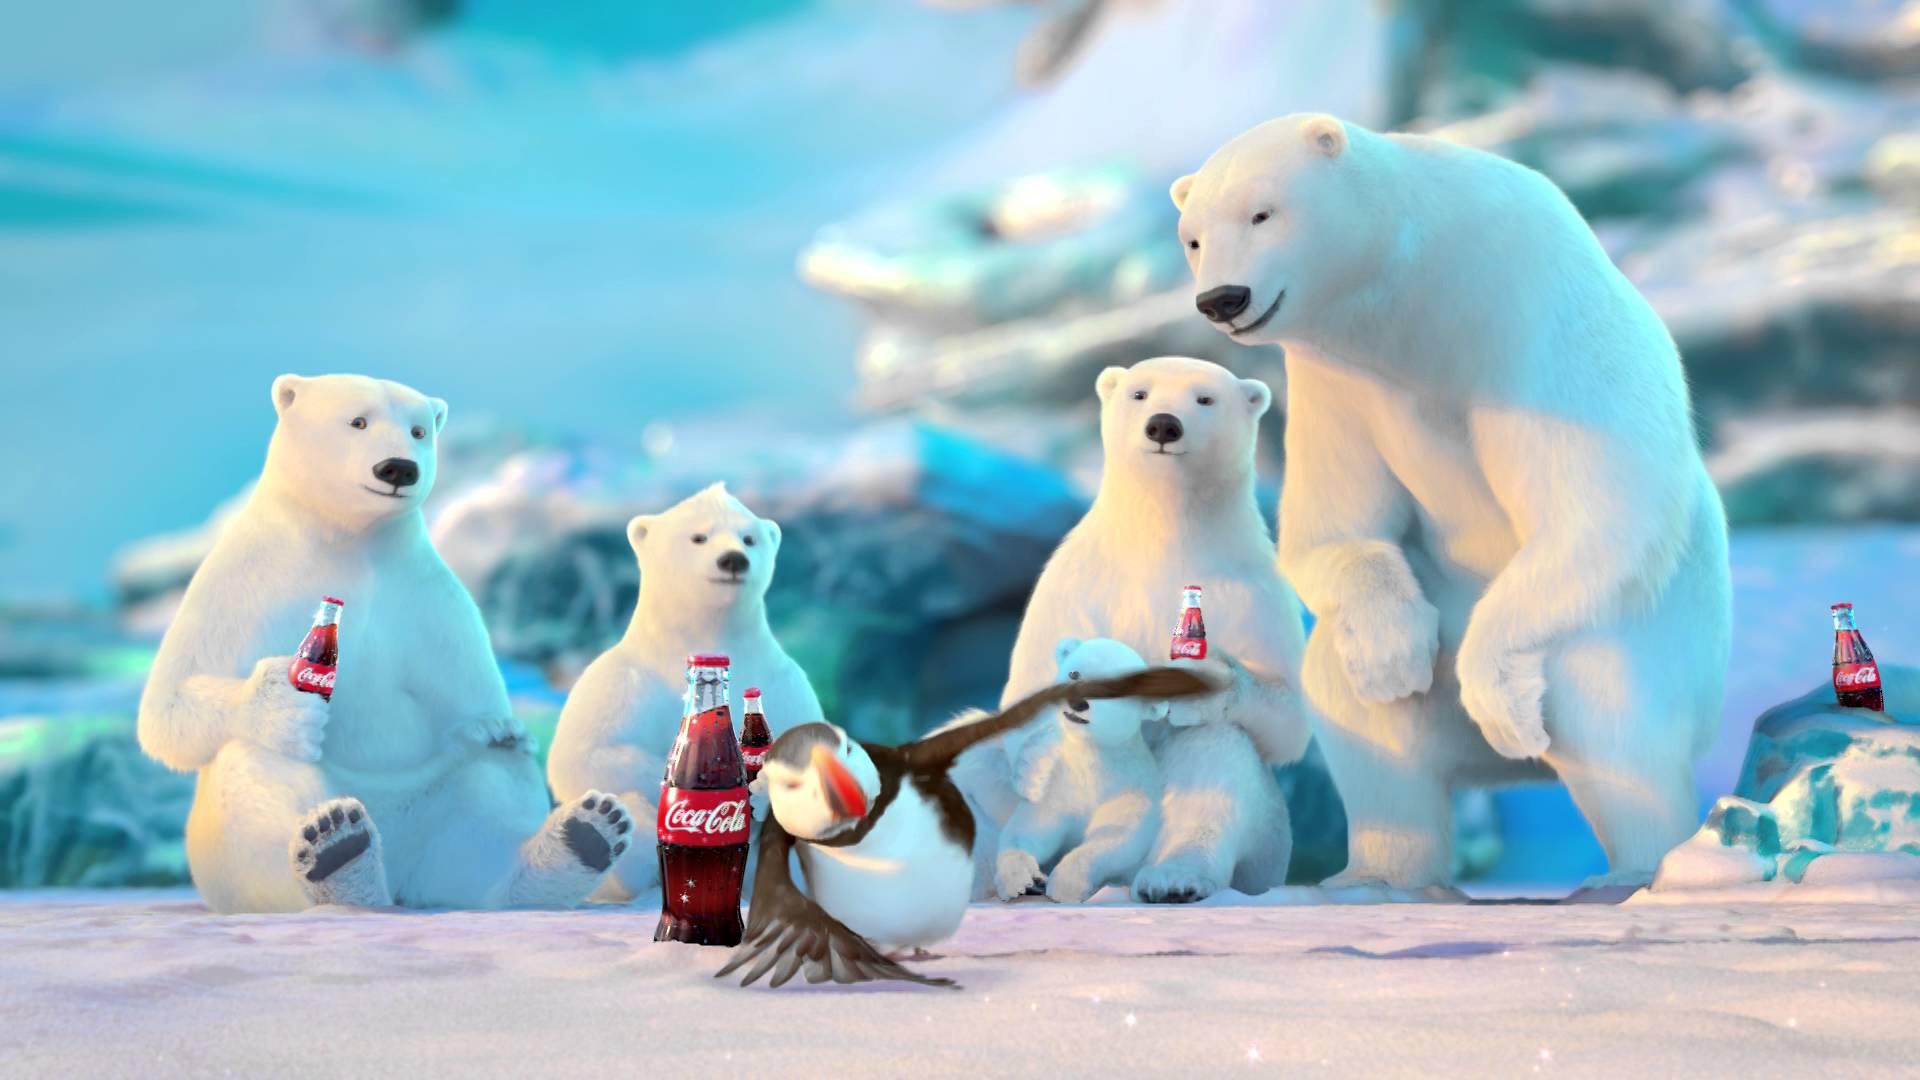 Coca Cola Polar Bear Wallpaper Coca Cola Bears Christmas 3074534 Hd Wallpaper Backgrounds Download